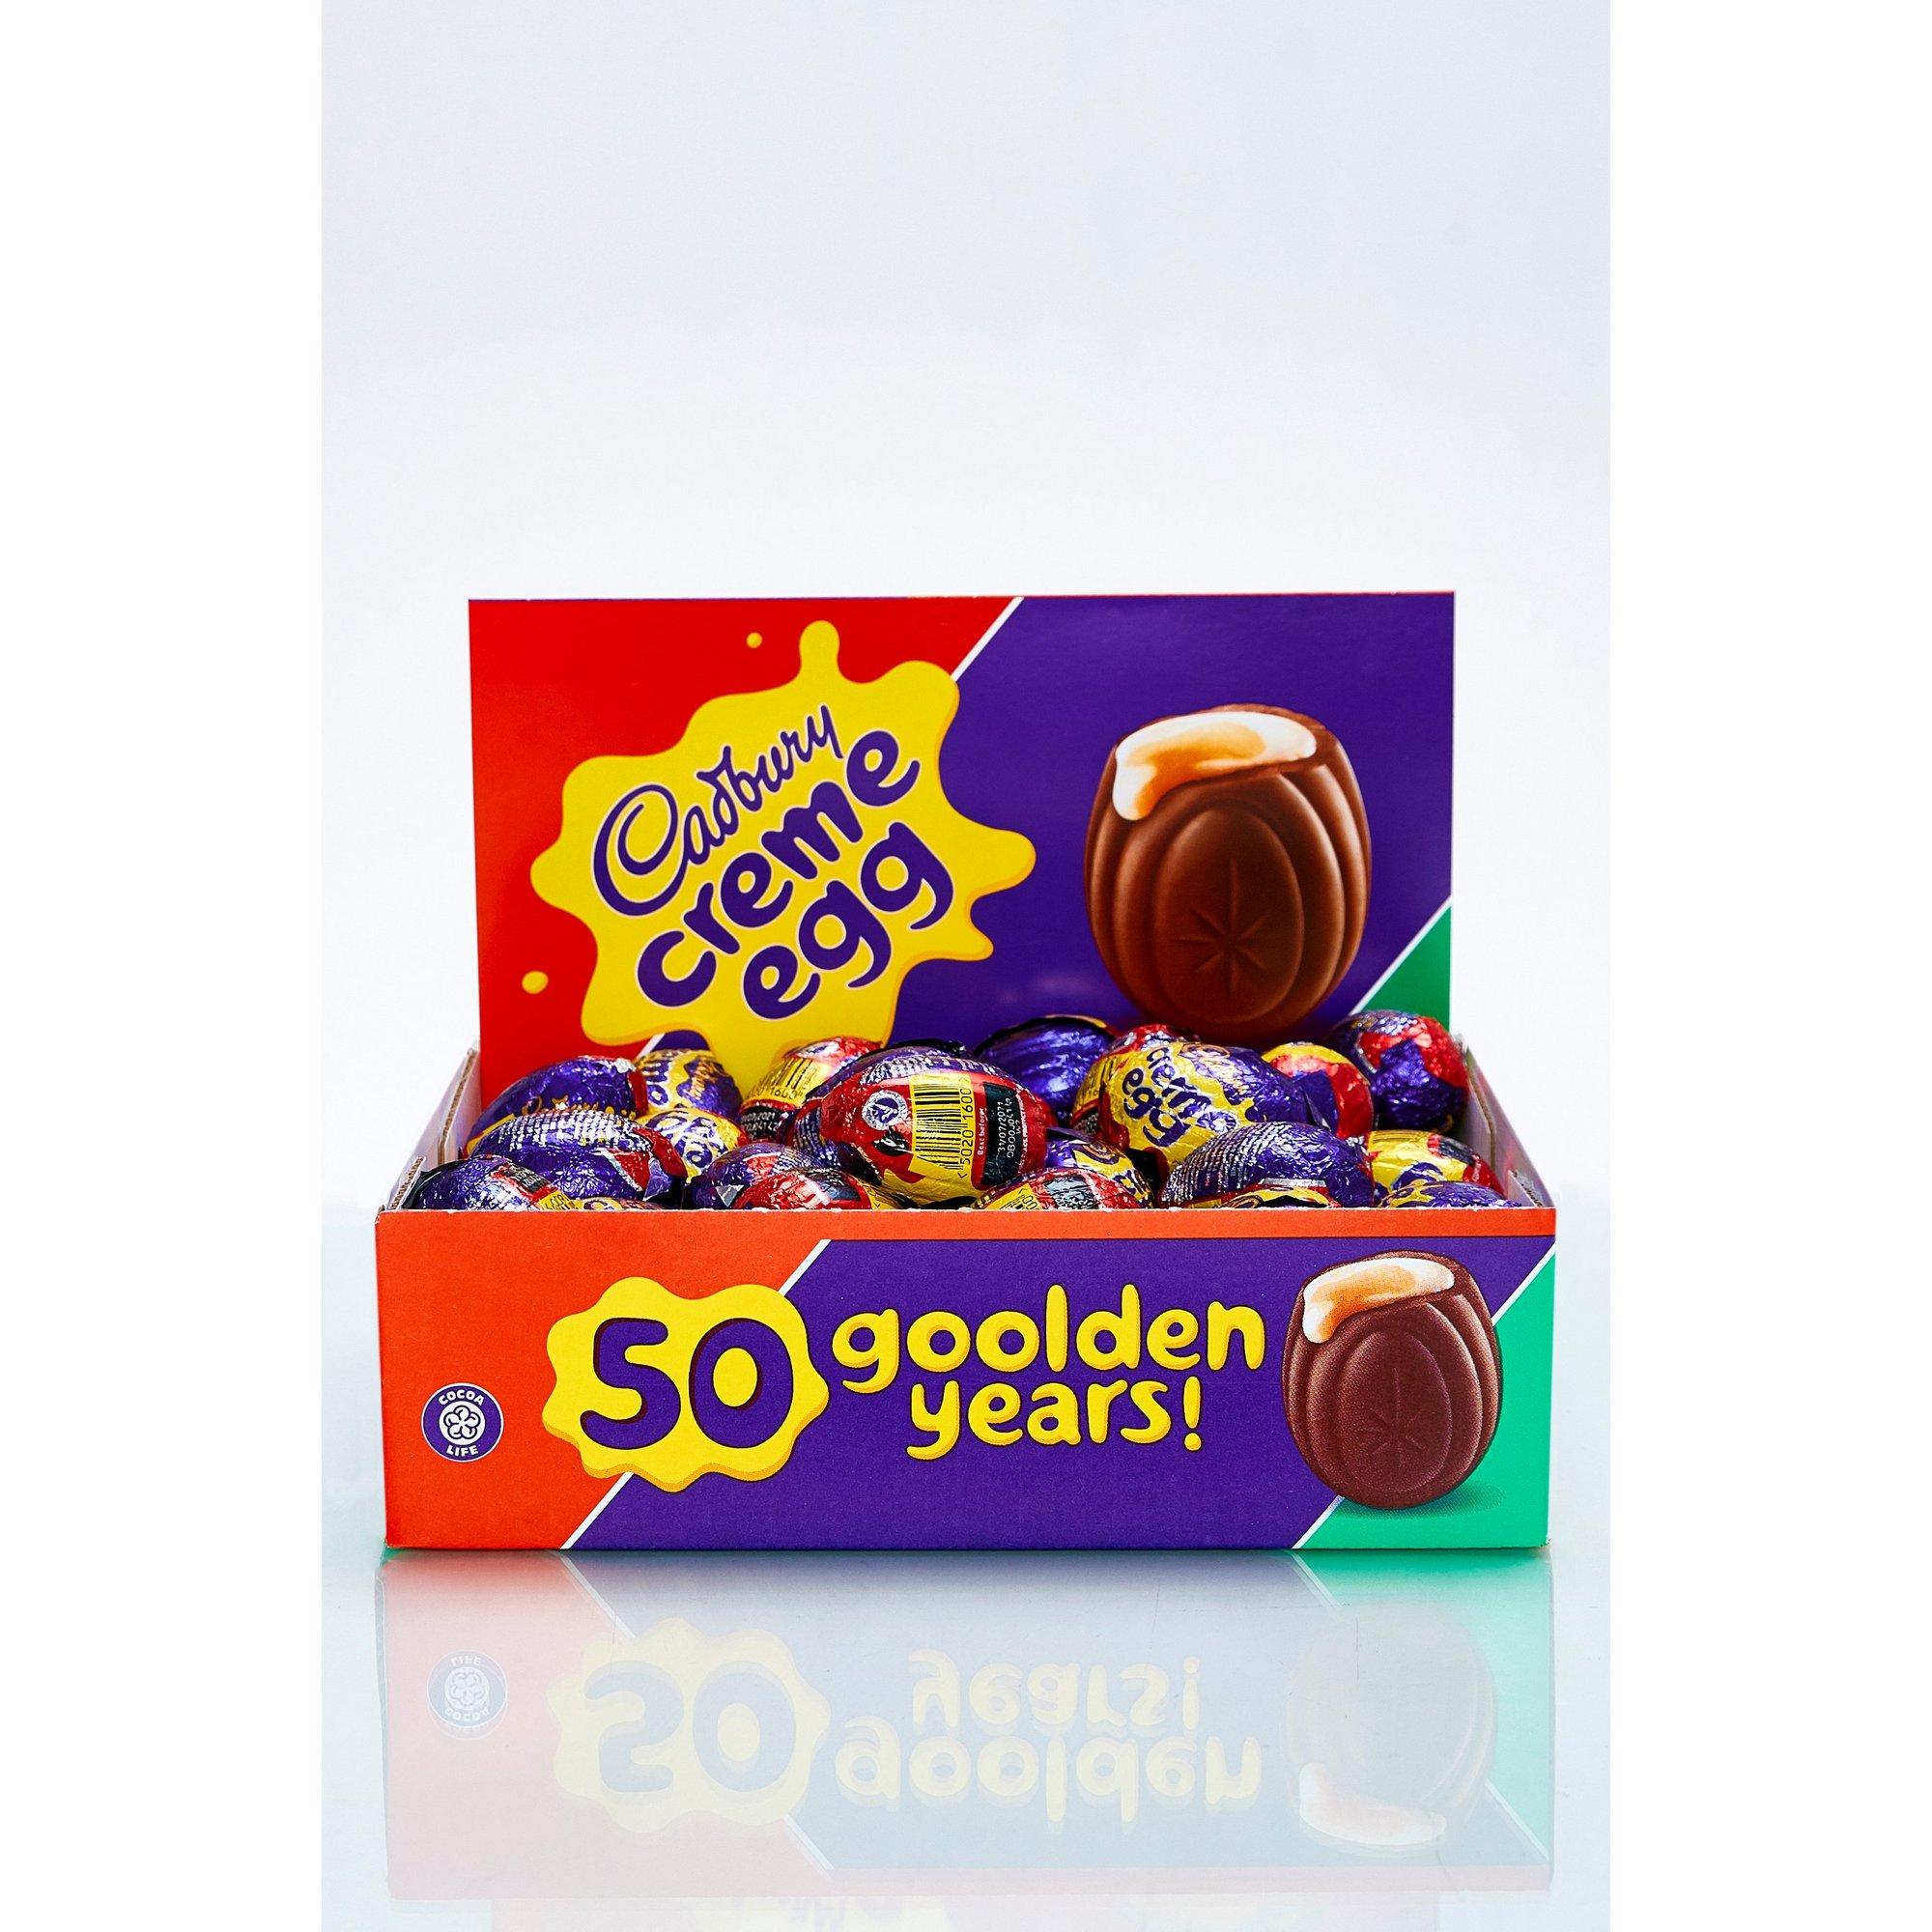 Image of Cadbury Creme Egg Box 48